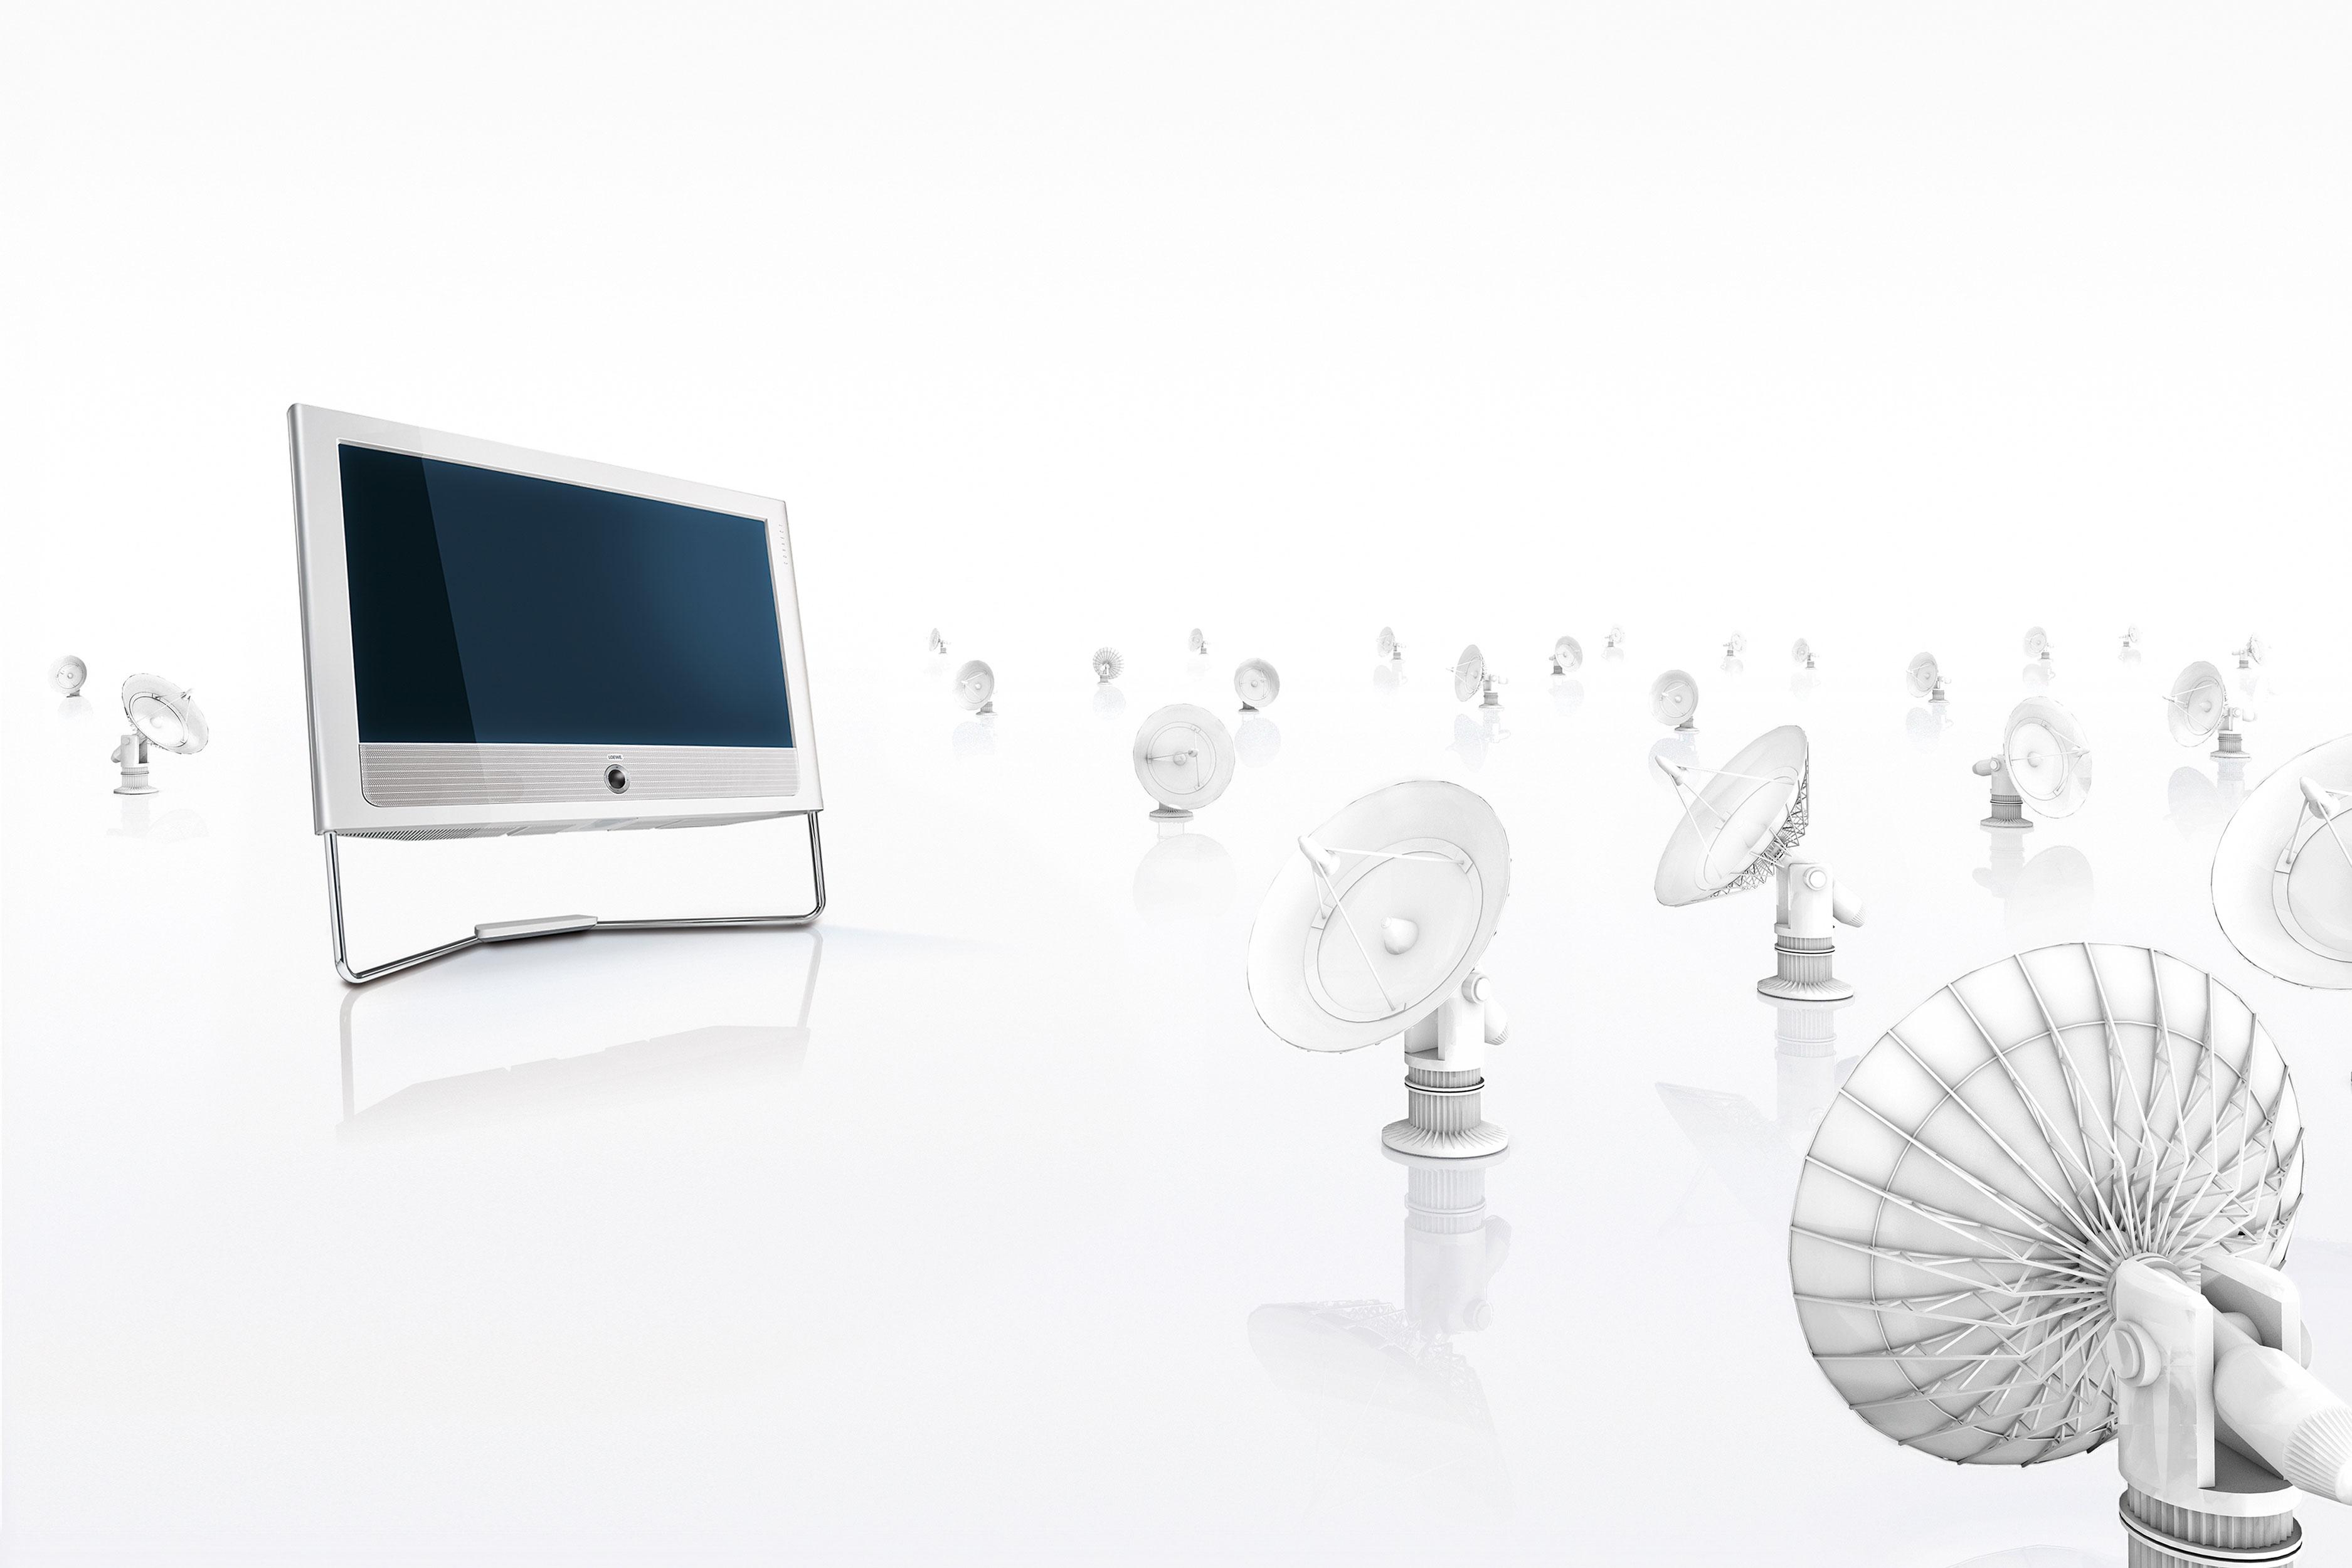 CGI Rendering 3d Loewe TV Highkey Weiss Radioteleskope Idris Kolodziej